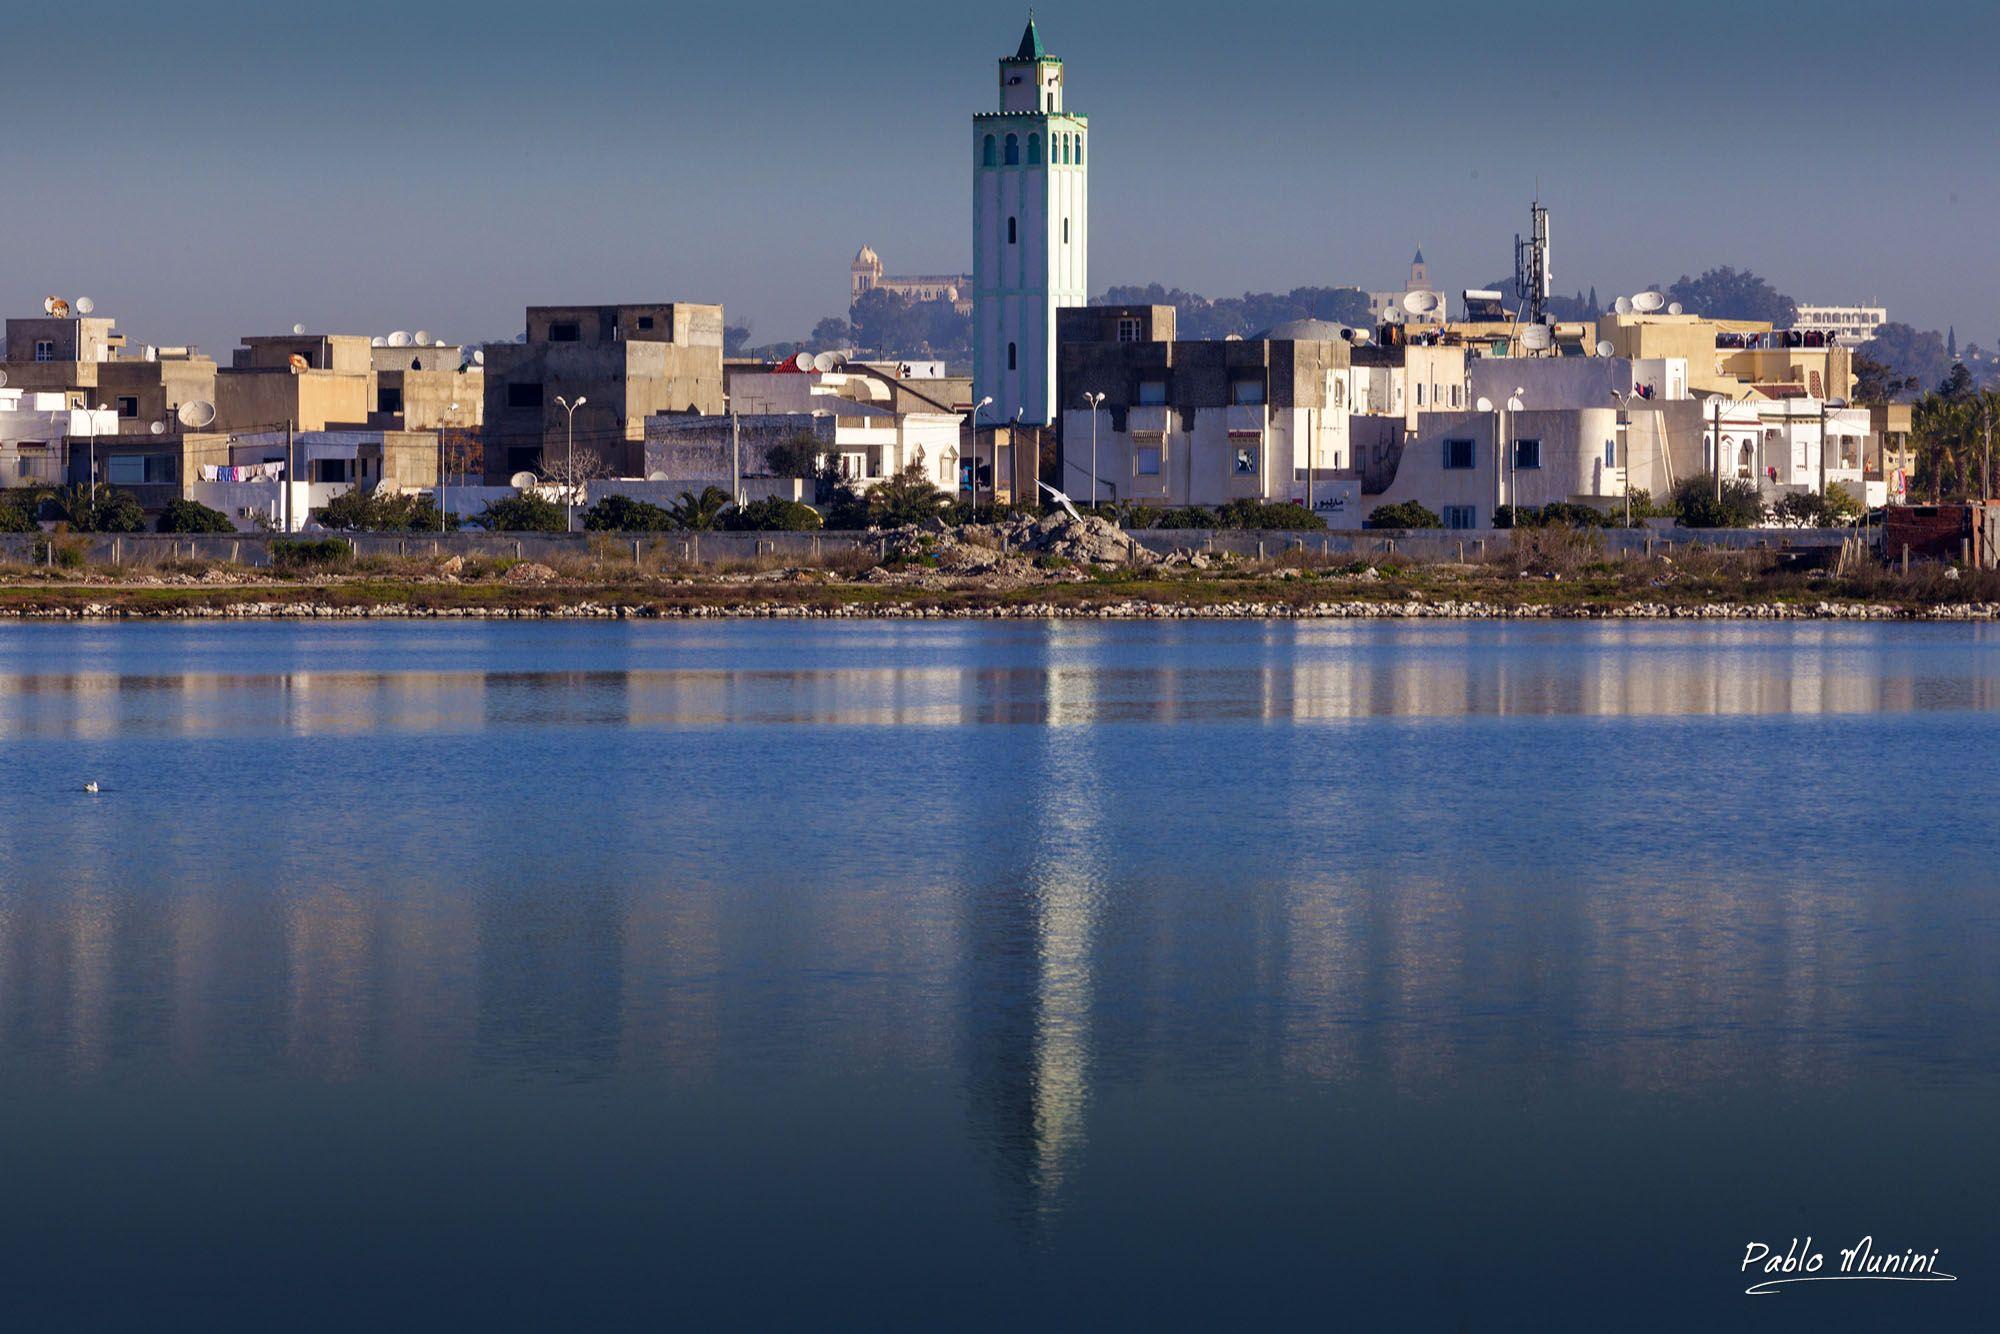 Tunisie Cote Mer La Goulette Tunis Tunesien